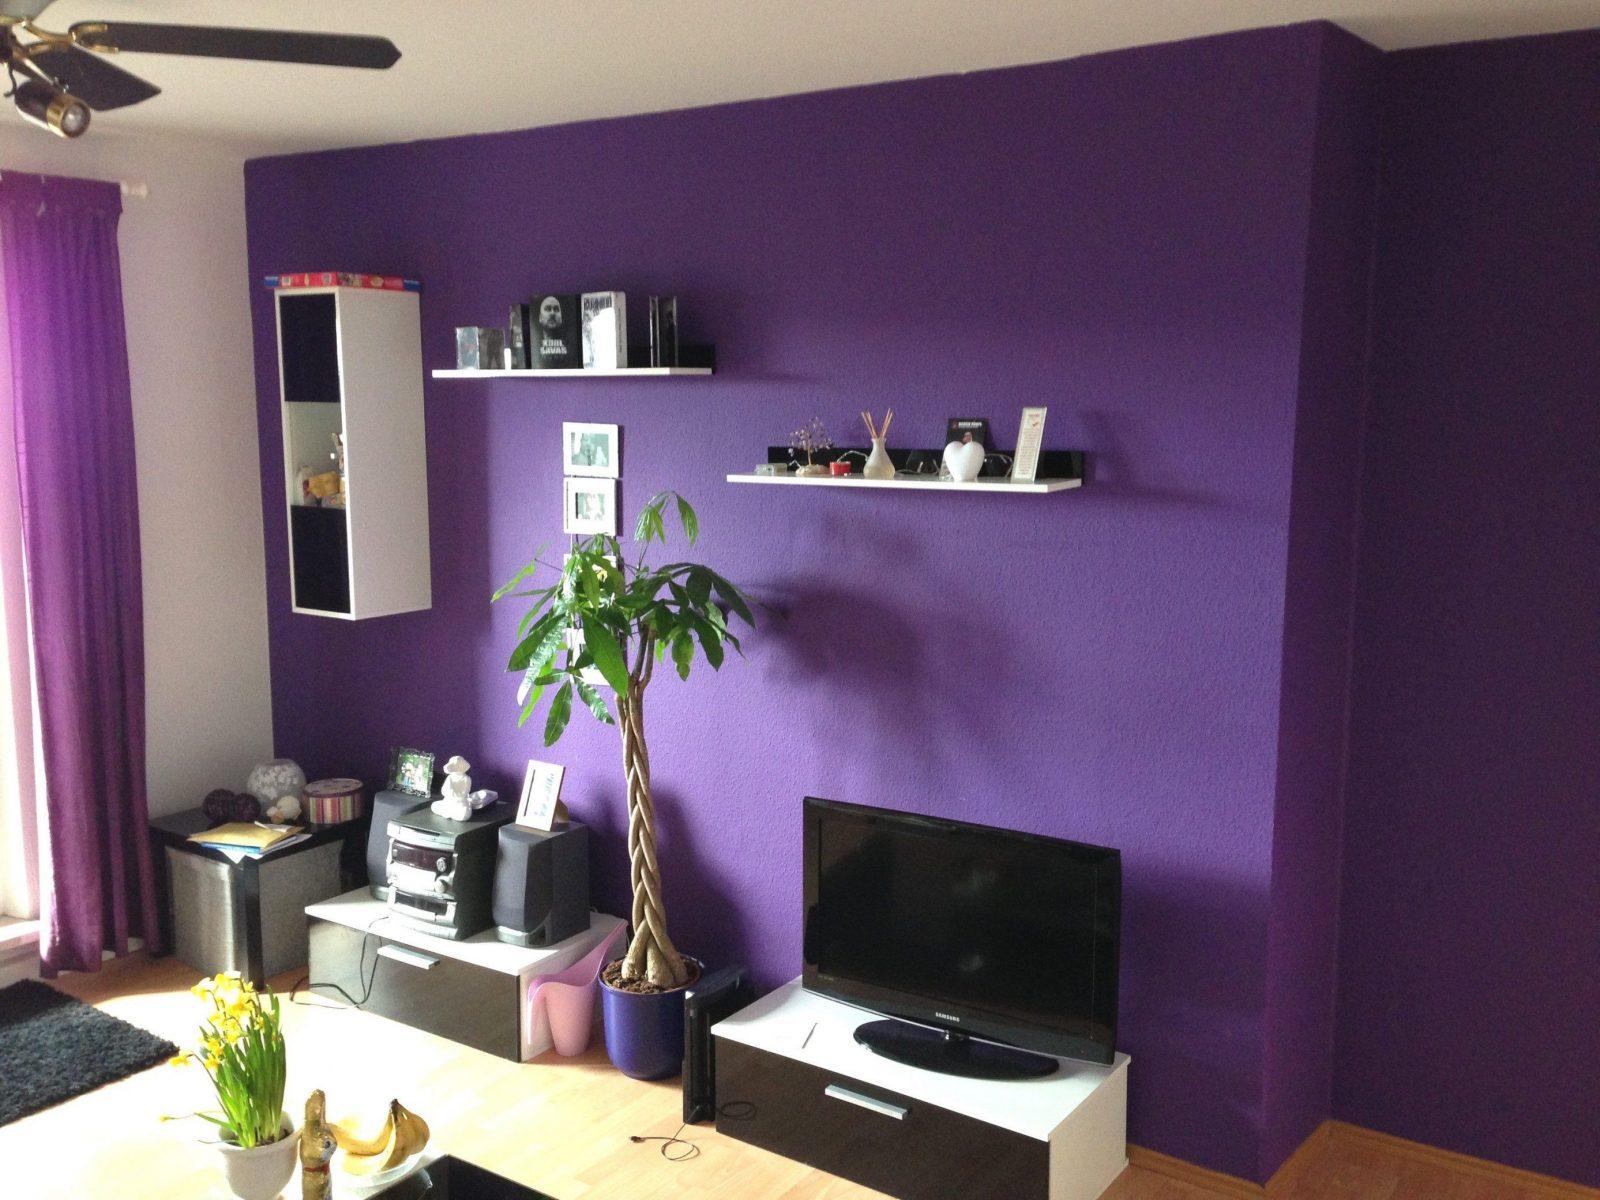 ... Tapeten Lila Farbe Wandgestaltung Skillful Ideas Wandgestaltung Lila  Von Tapeten Lila Farbe Wandgestaltung Bild ...